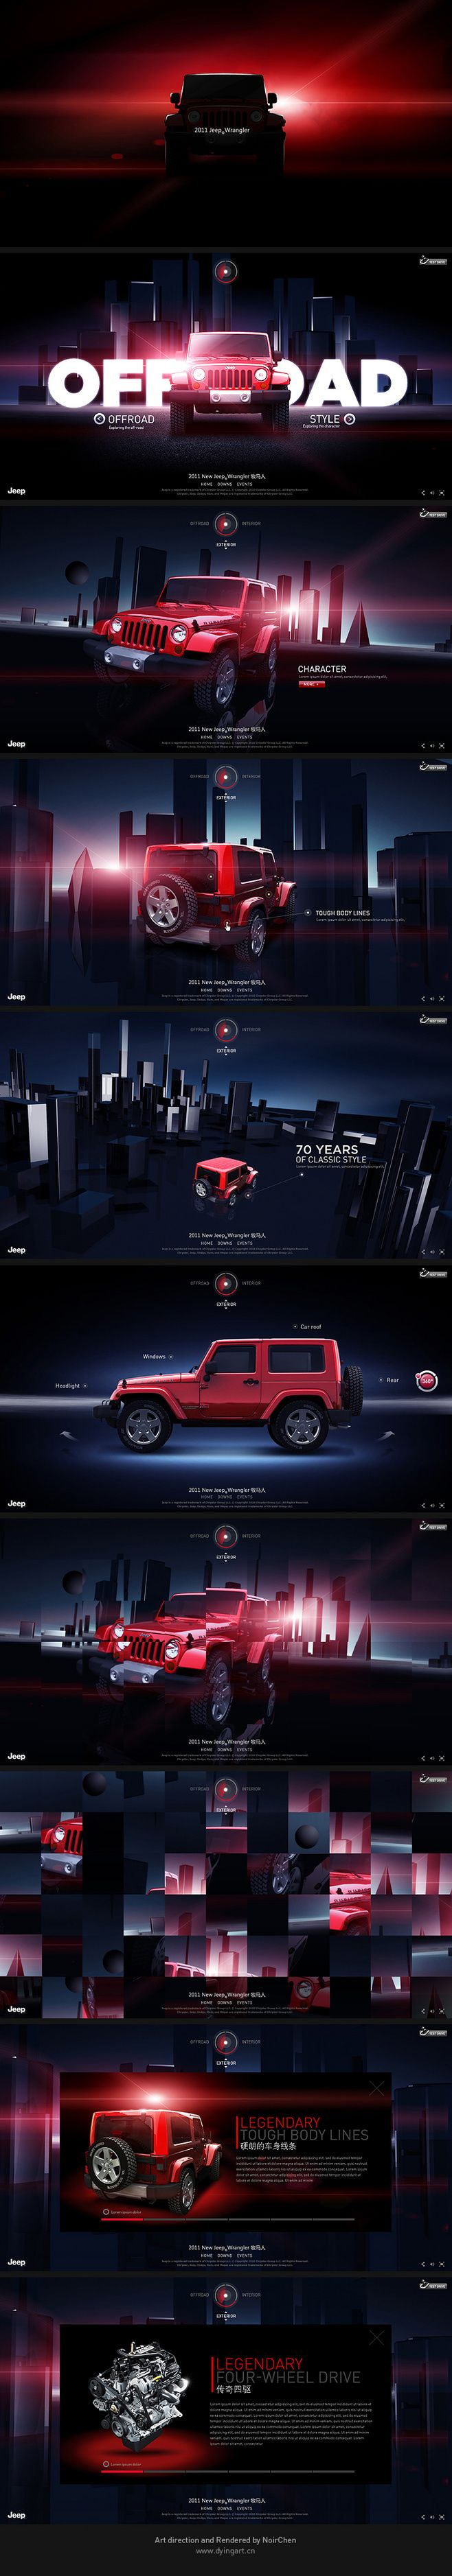 Noir Chen » Jeep Wra...